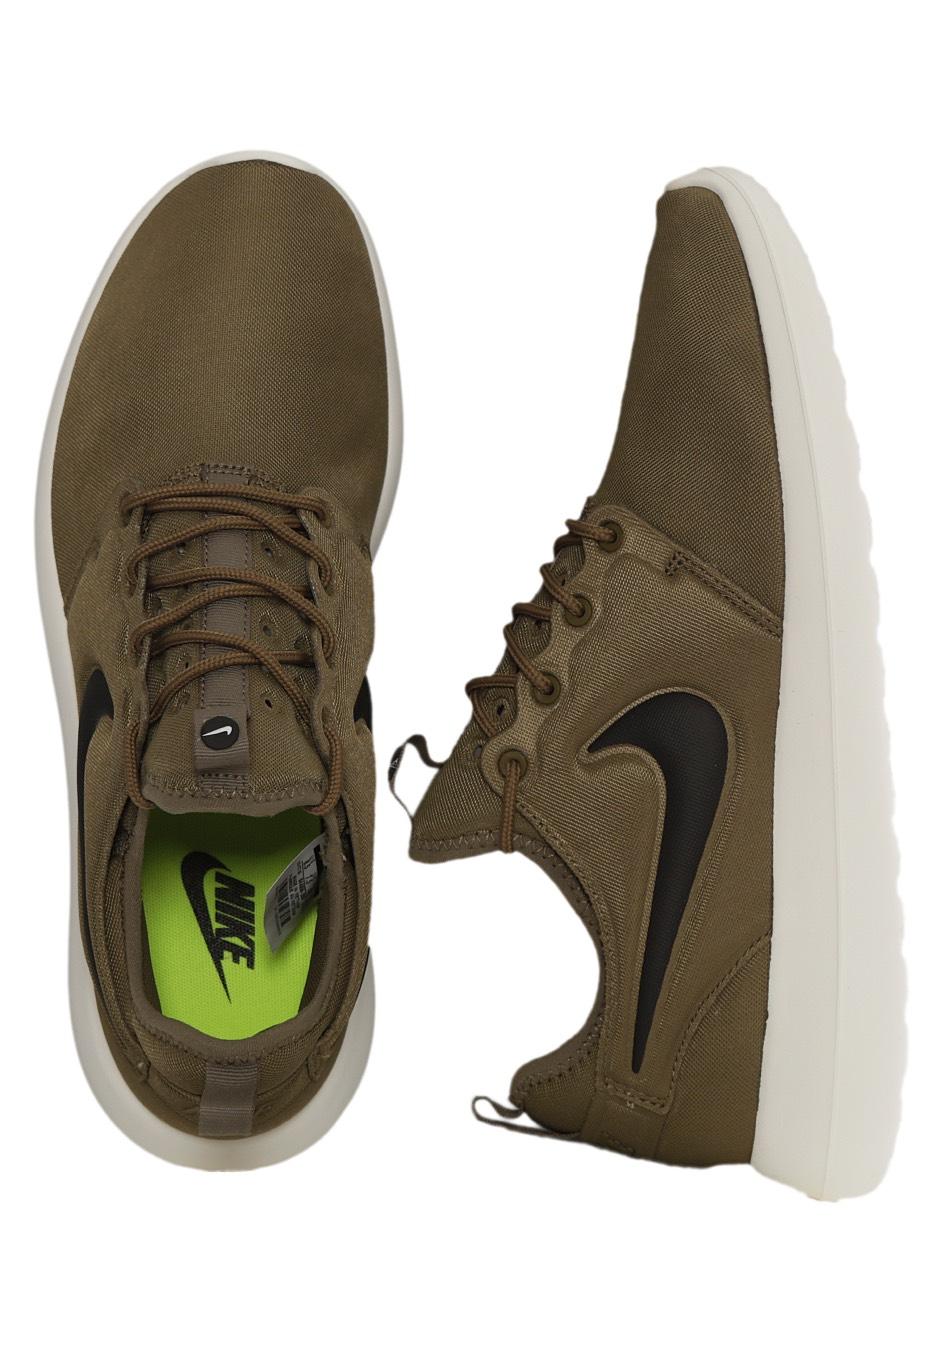 8714483ac0a Nike - Roshe Two Iguana Black Sail Volt - Shoes - Impericon.com UK